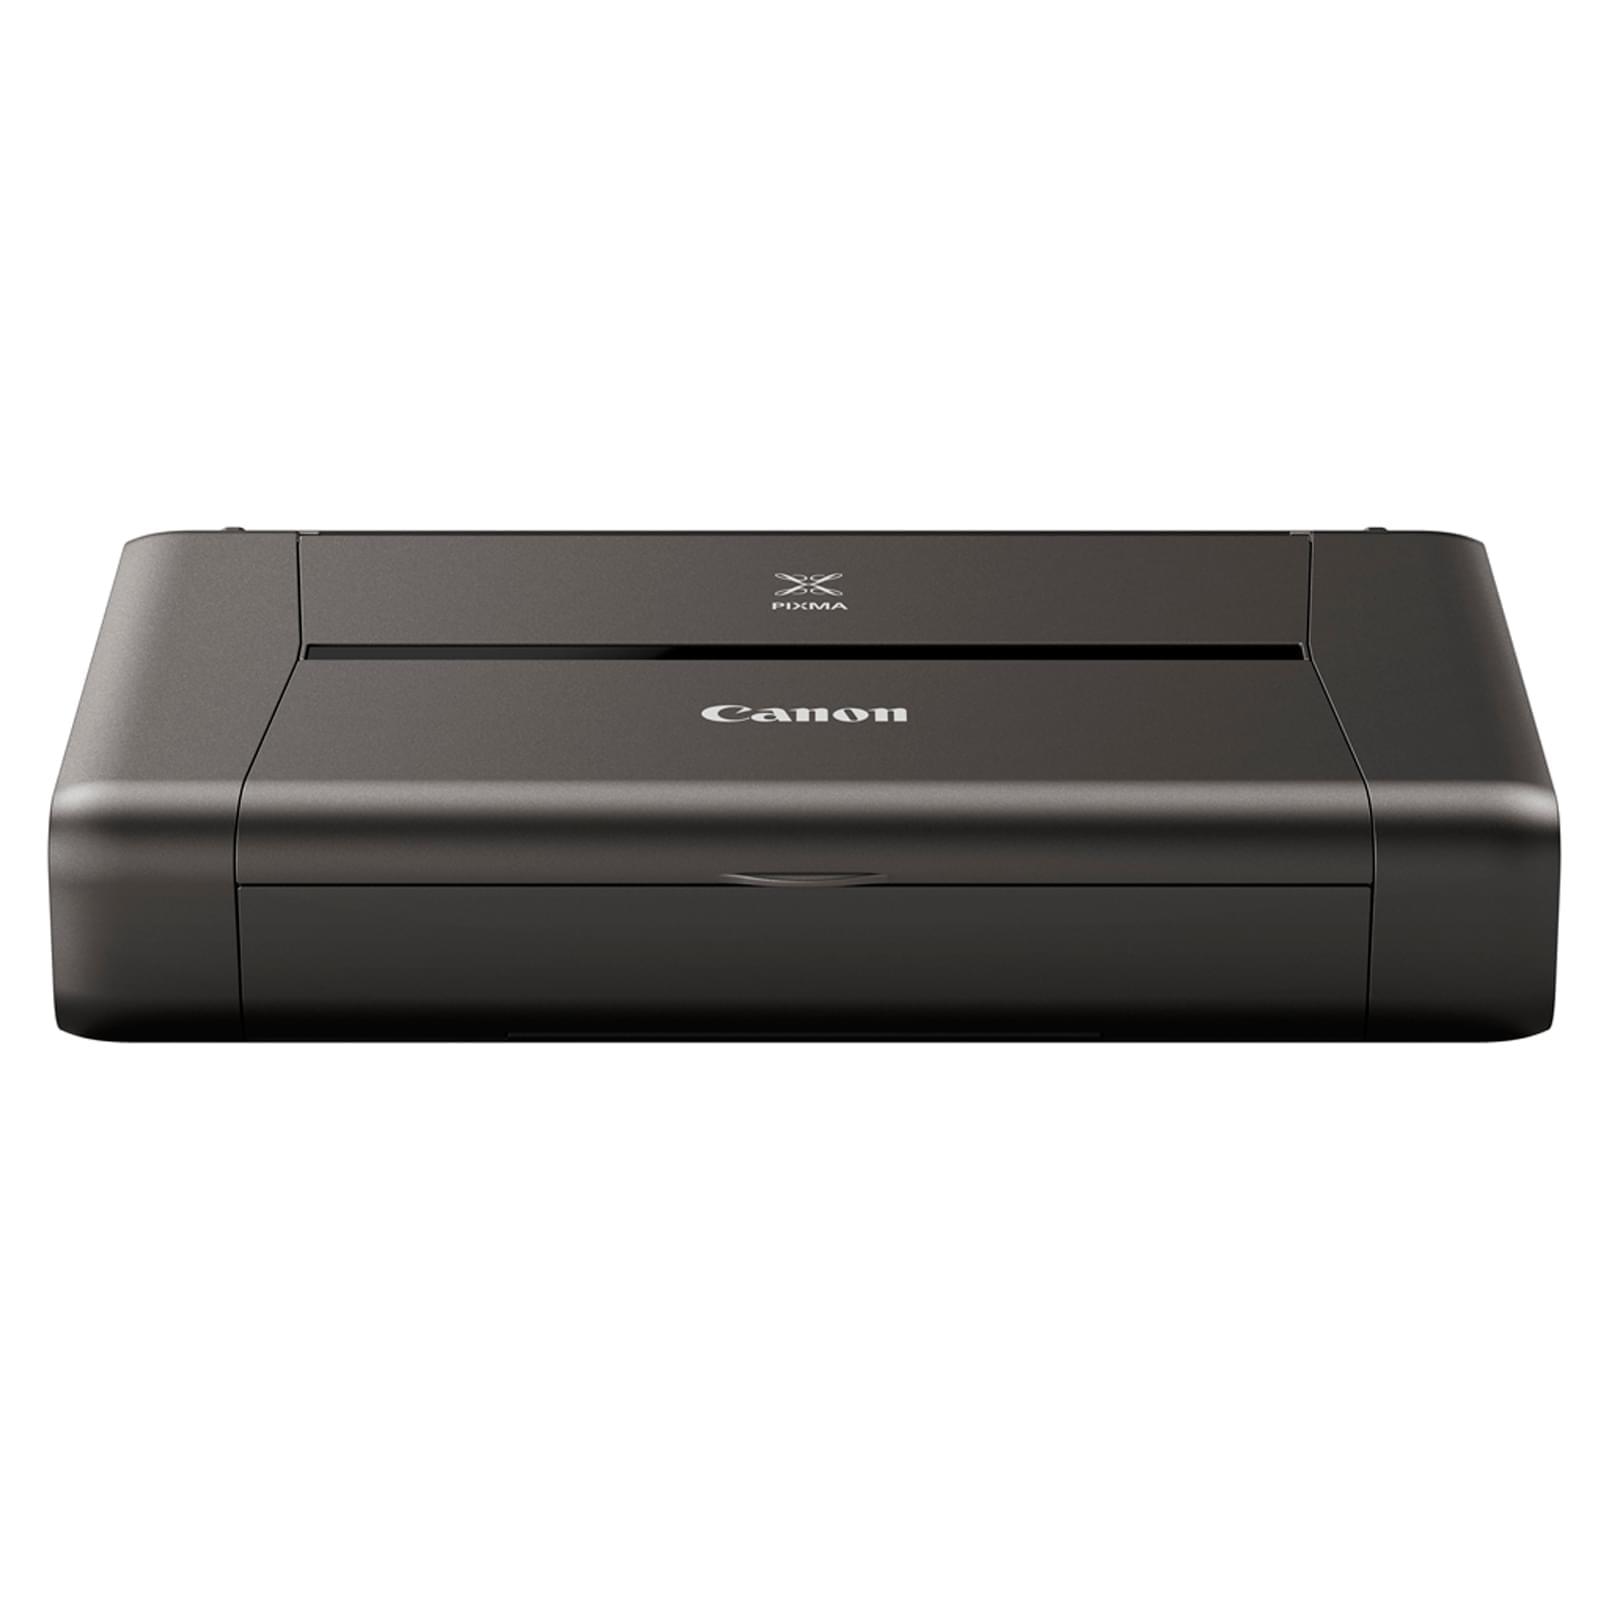 Imprimante Canon iP110w avec batterie - Cybertek.fr - 0